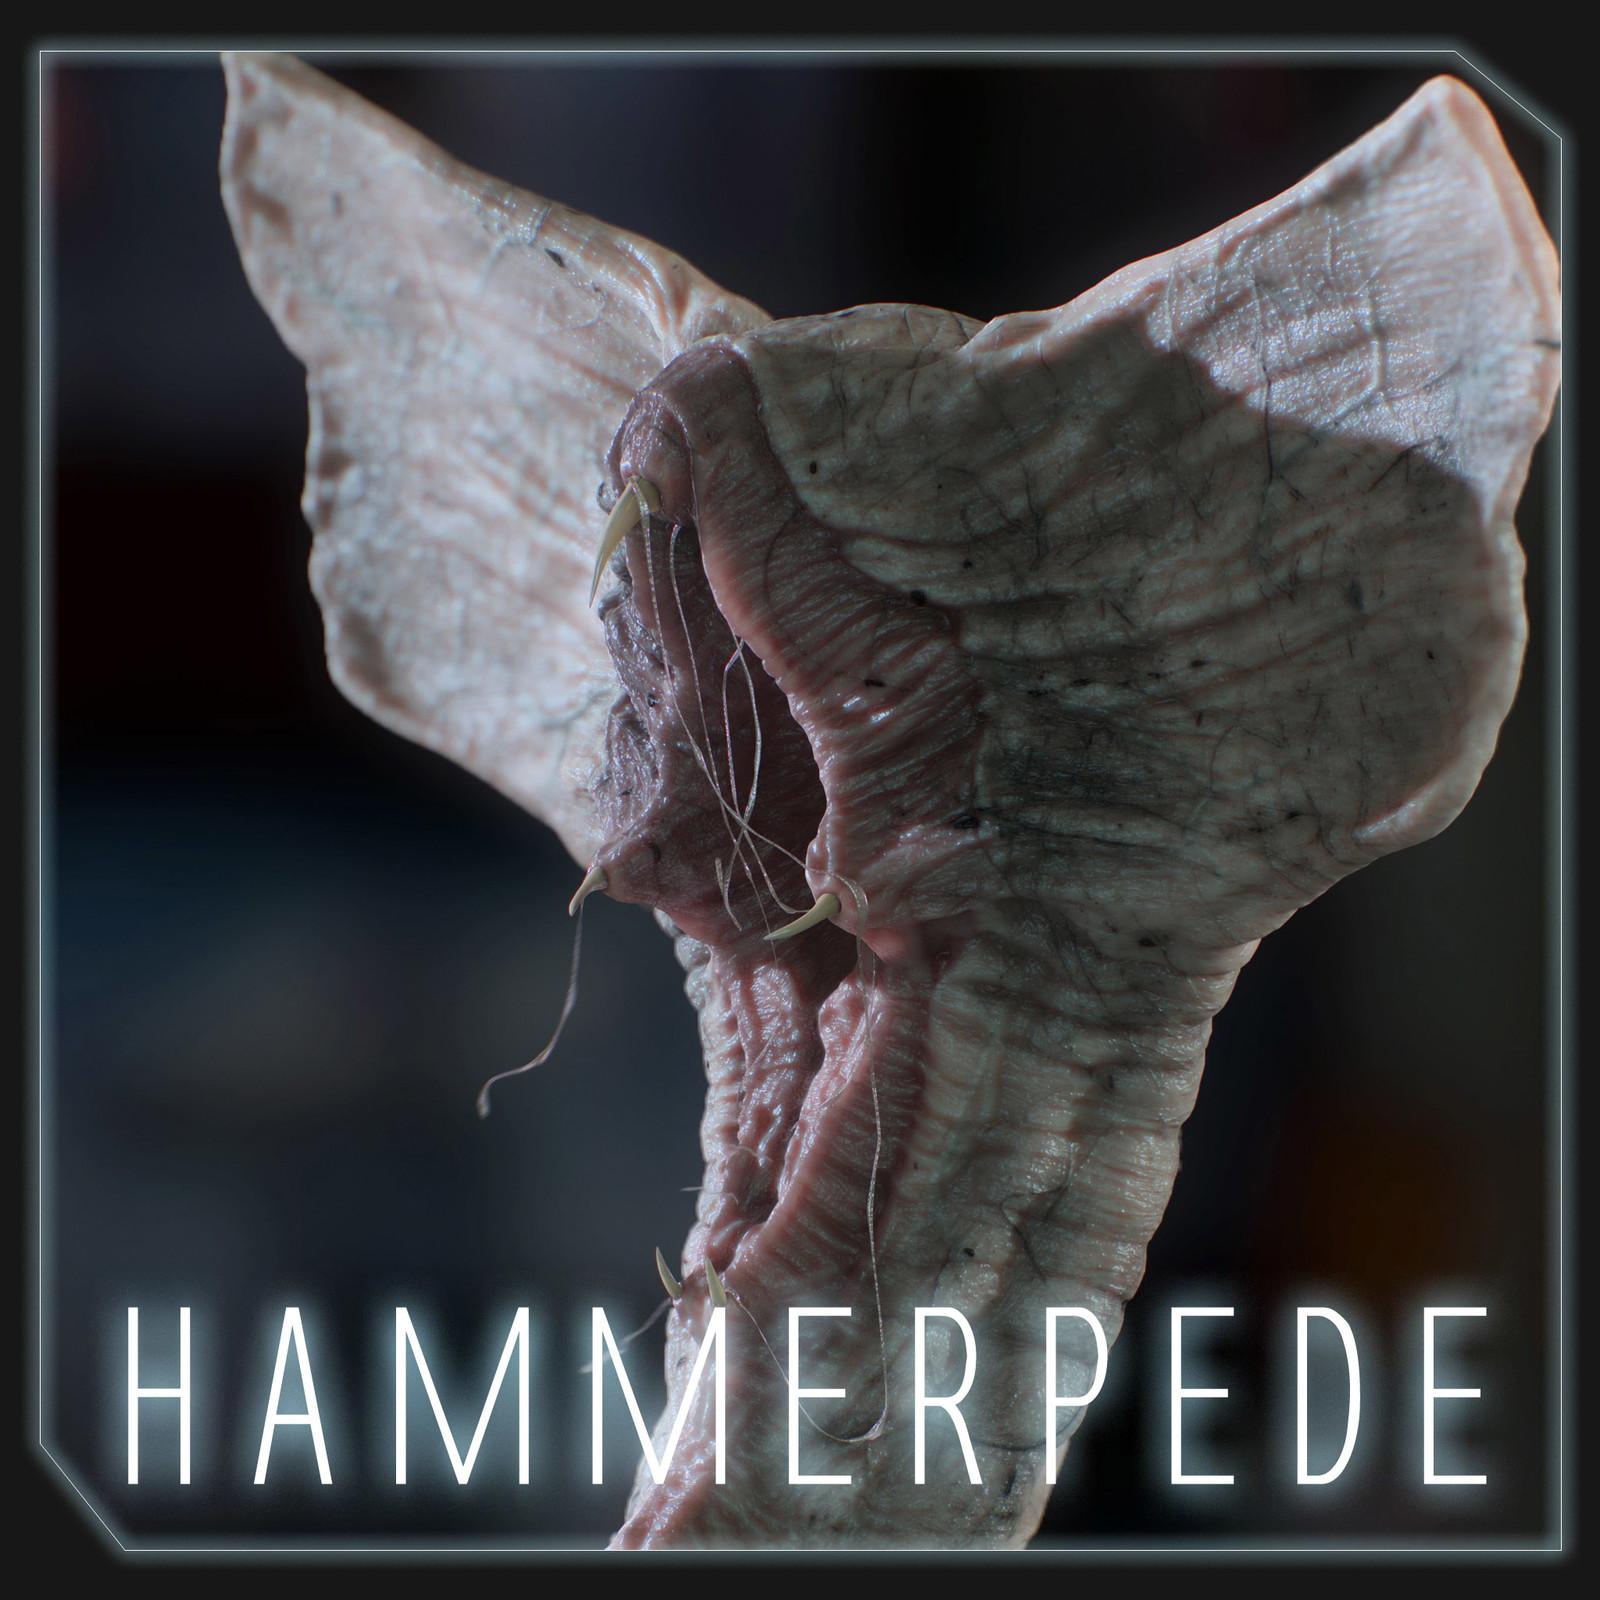 Hammerpede Prometheus Original Concept Art